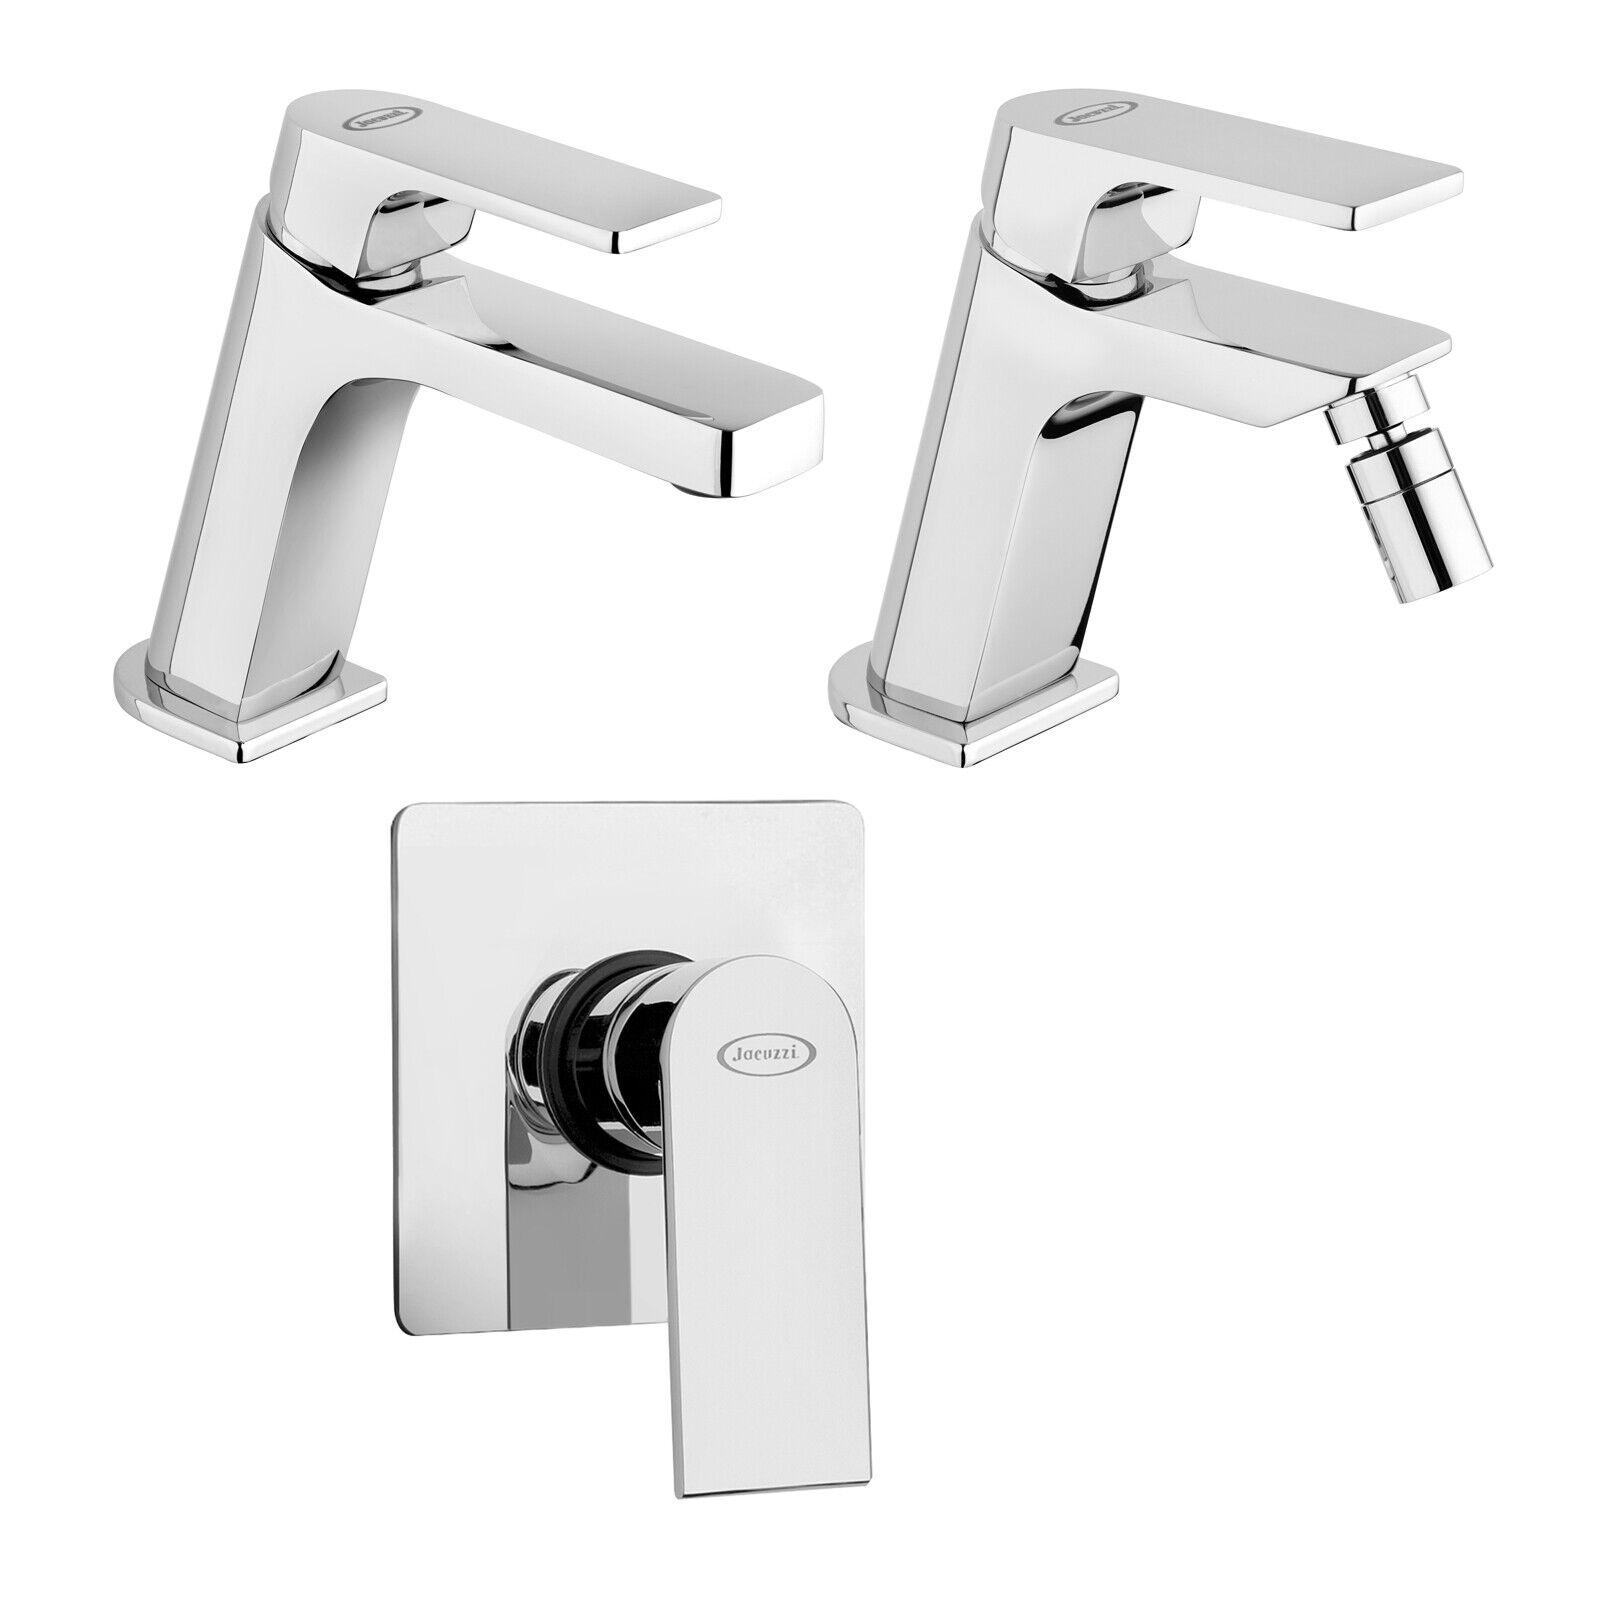 Set di miscelatori Jacuzzi - Rubinetteria Plaza bidet lavabo e incasso doccia